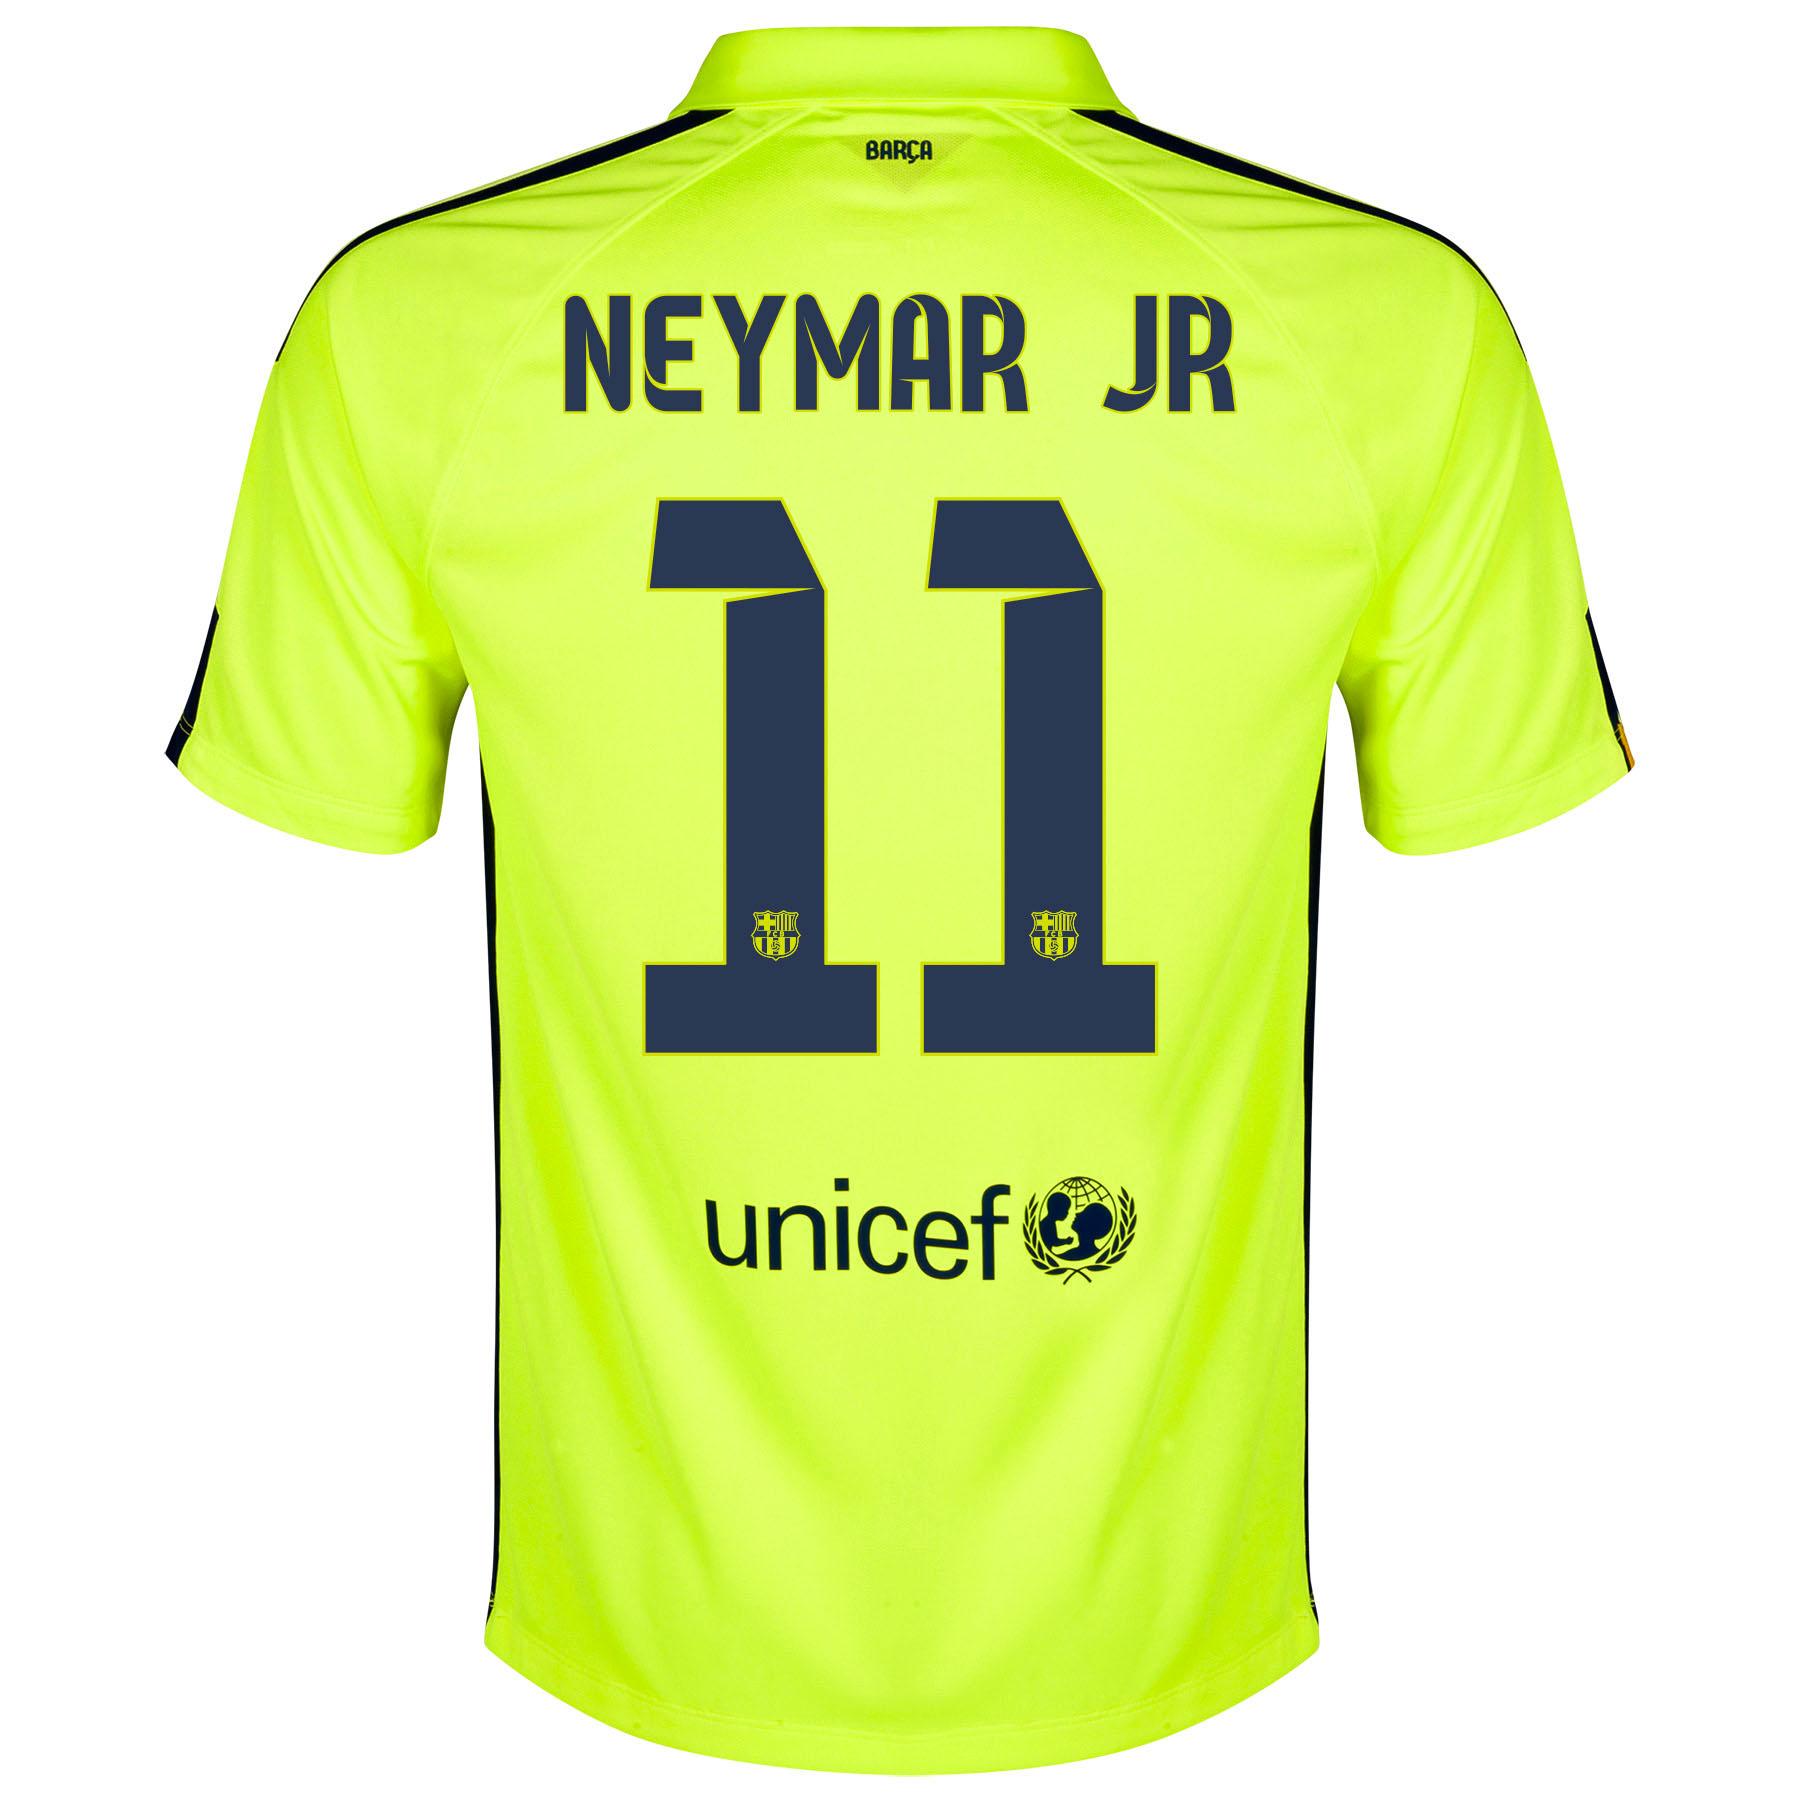 Barcelona Third Shirt 2014/15 Yellow with Neymar Jr 11 printing